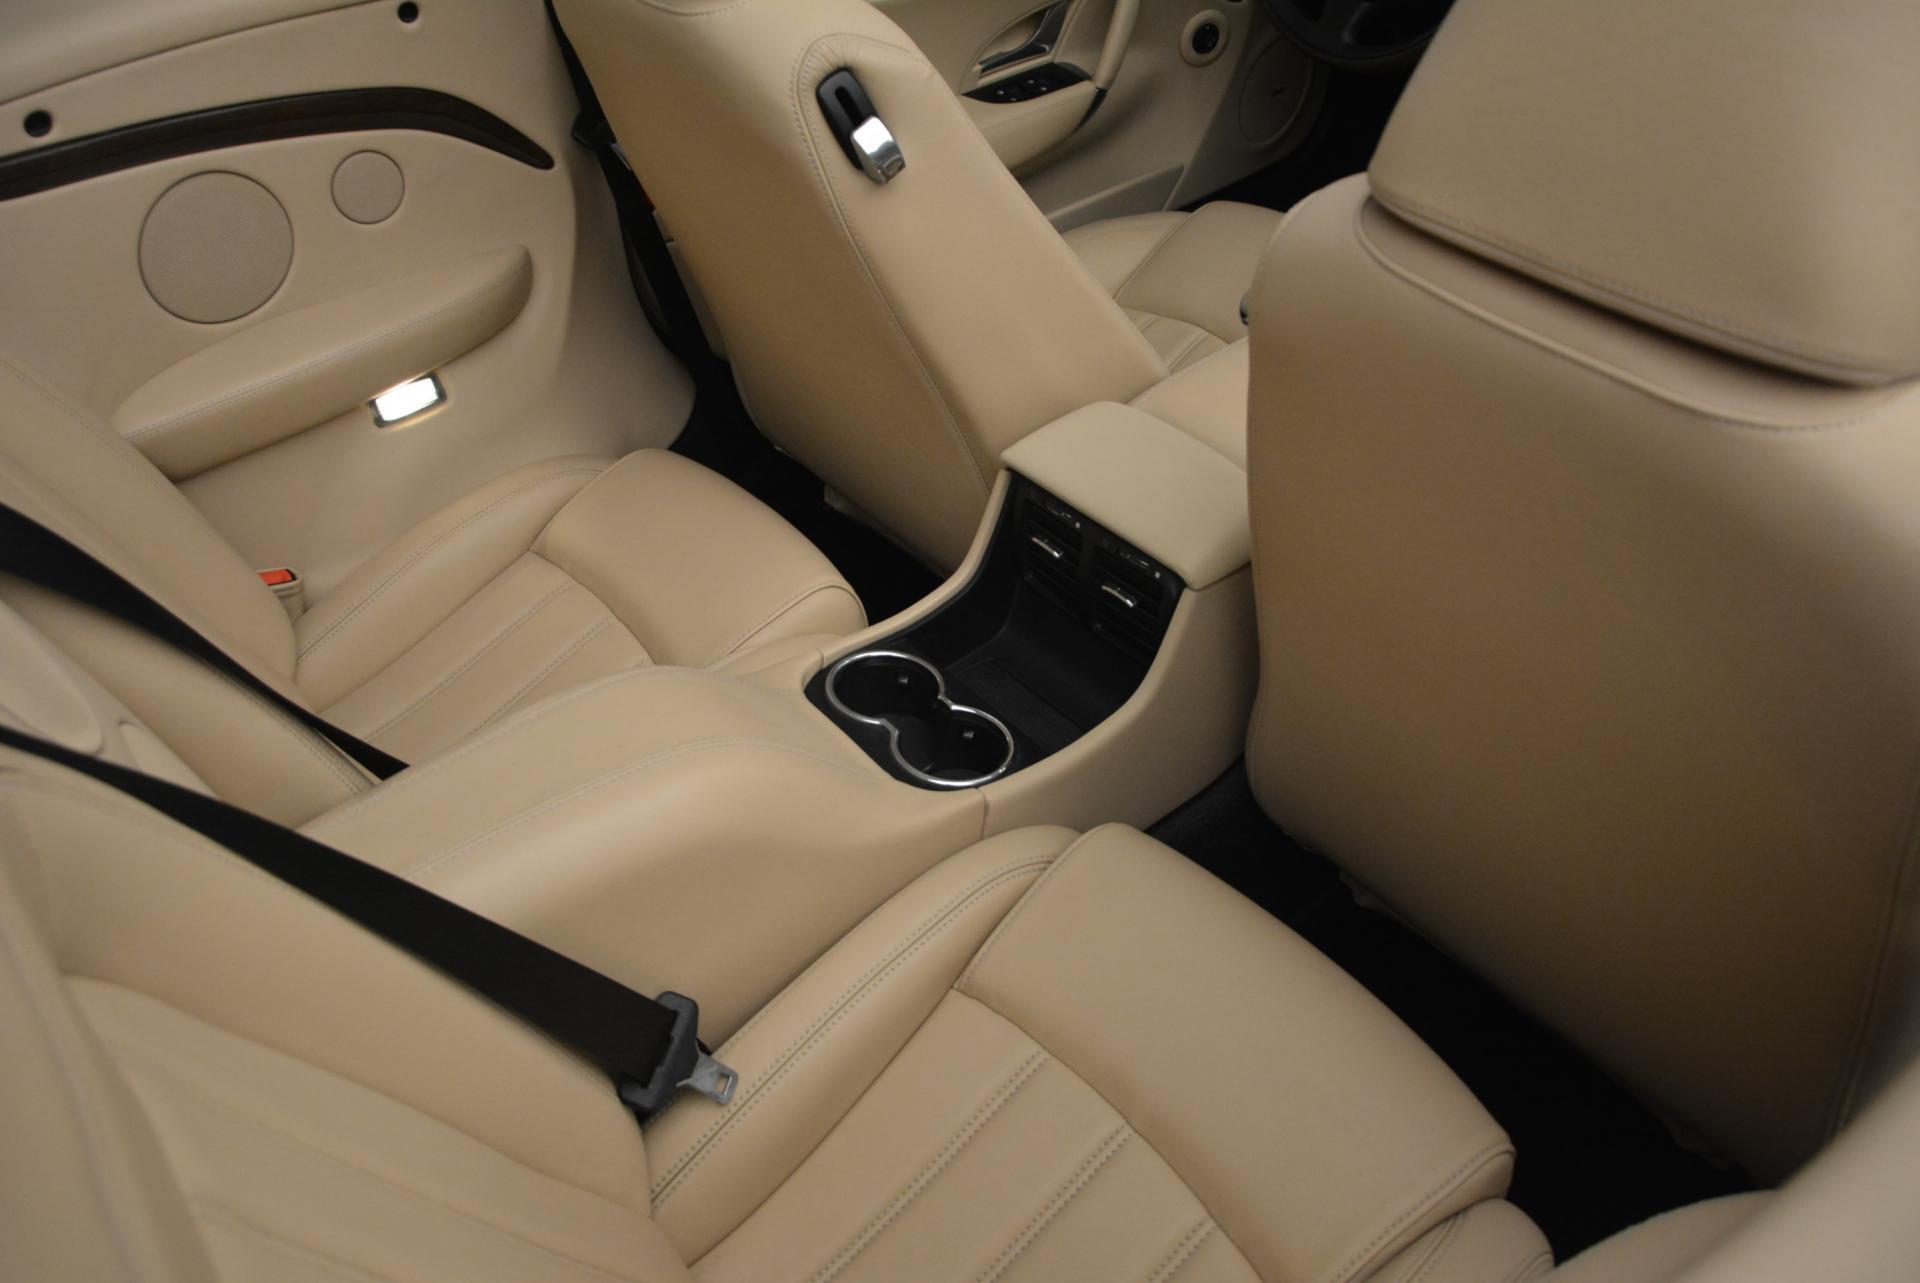 Used 2011 Maserati GranTurismo Base For Sale In Westport, CT 158_p36